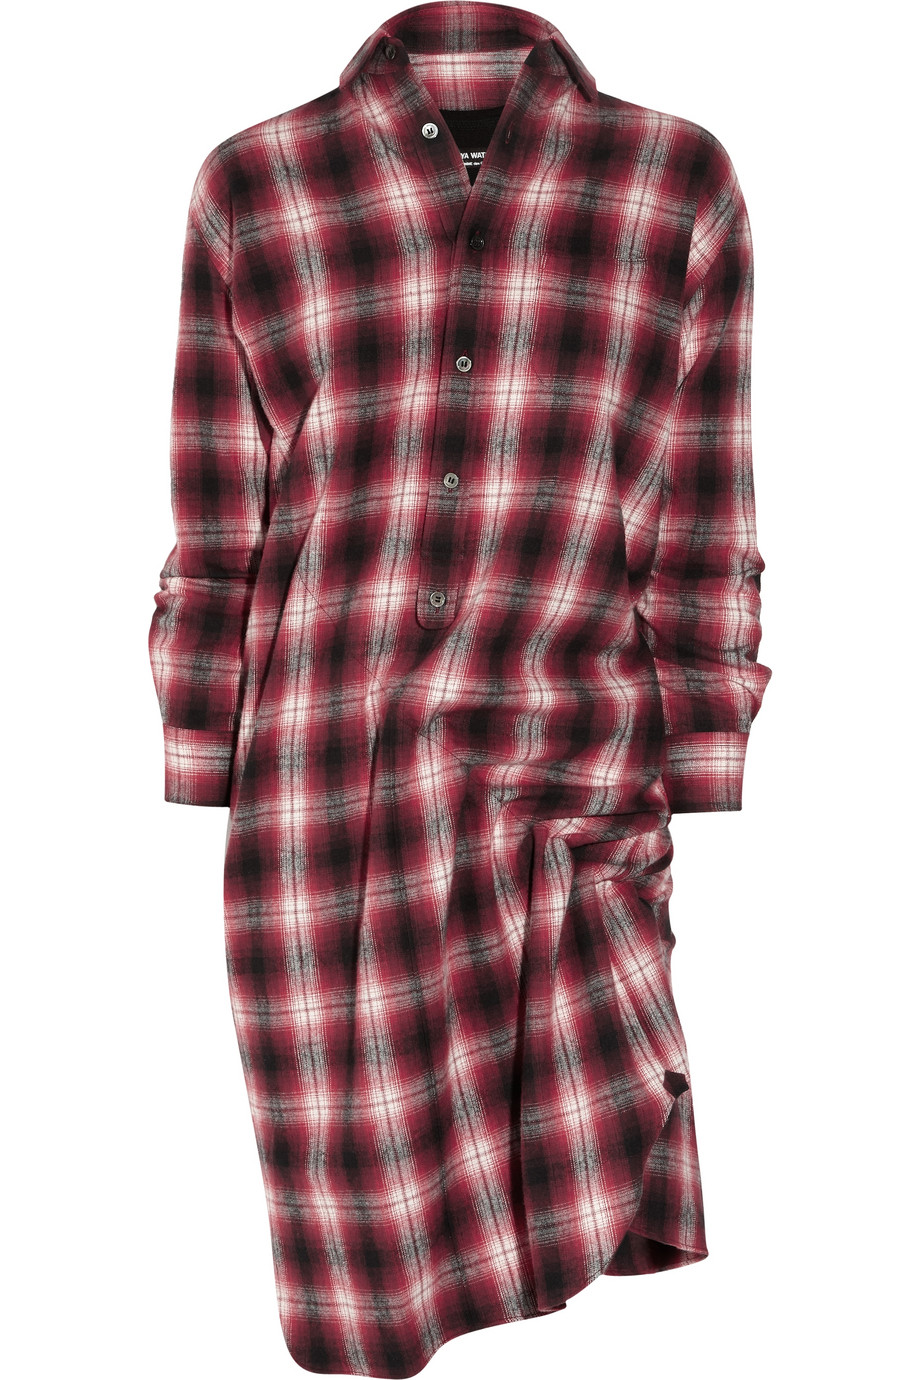 Junya watanabe asymmetric plaid cotton shirt dress in red for Red plaid dress shirt